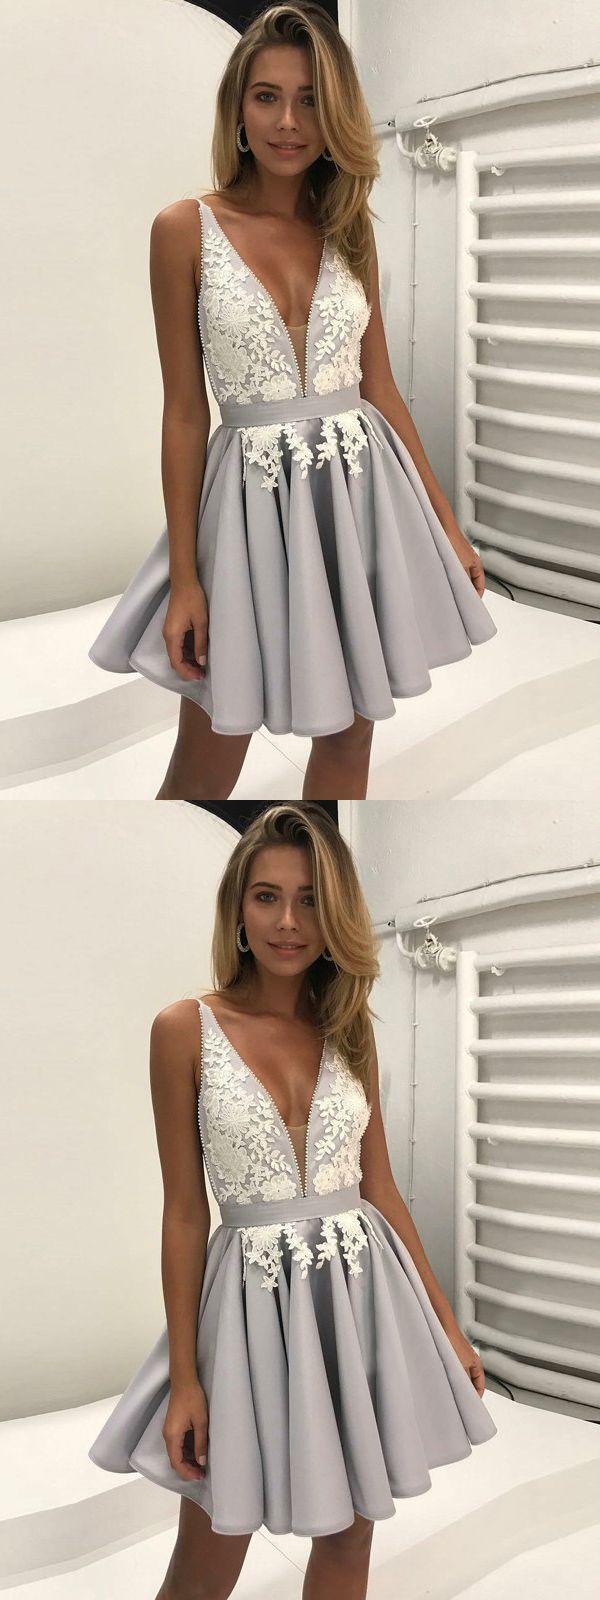 homecoming dresses,short homecoming dresses,cheap homecoming dresses,v-neck homecoming dresses,fashion homecoming dresses,